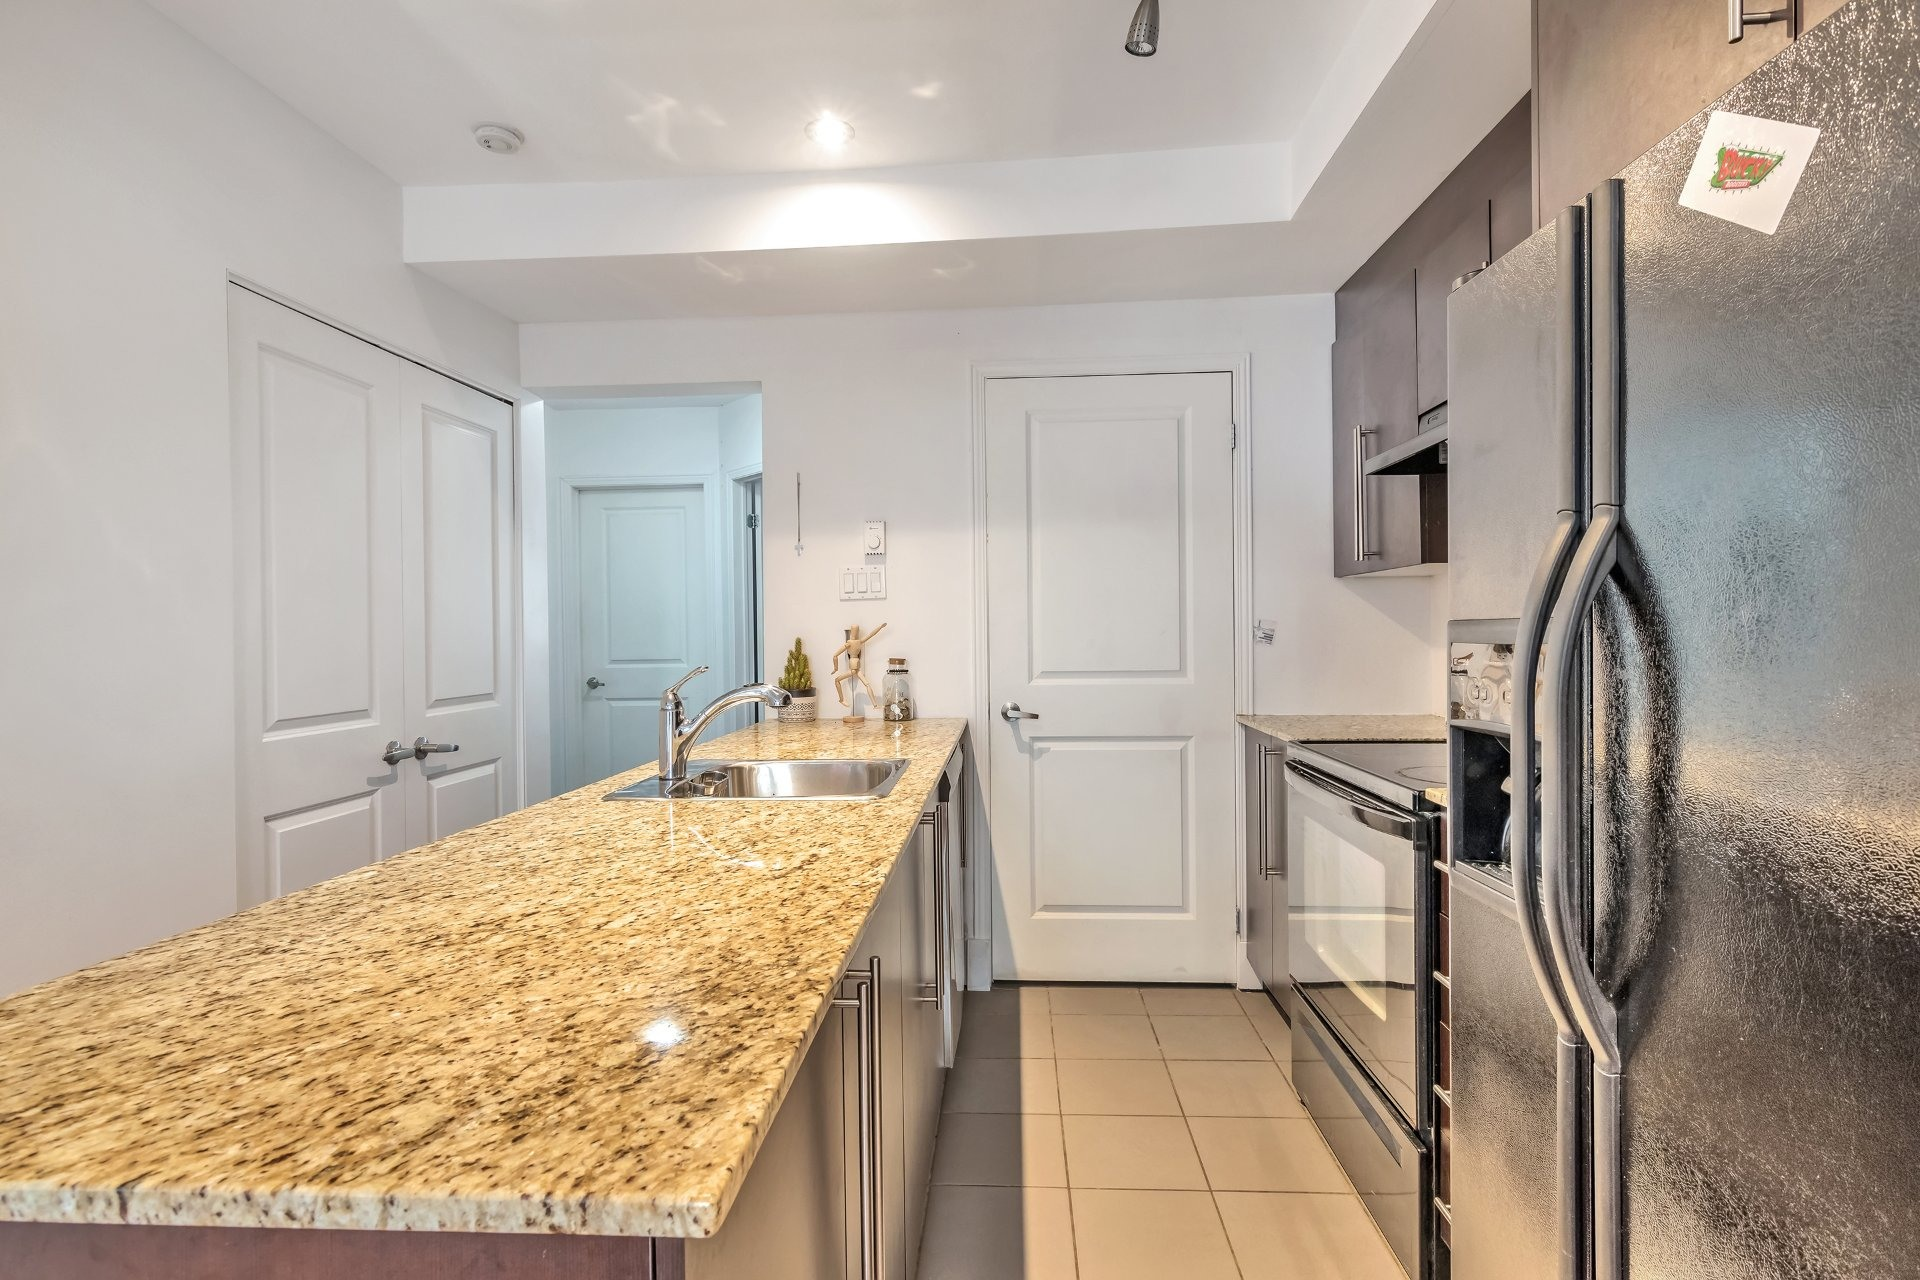 image 6 - Departamento En venta Le Plateau-Mont-Royal Montréal  - 3 habitaciones